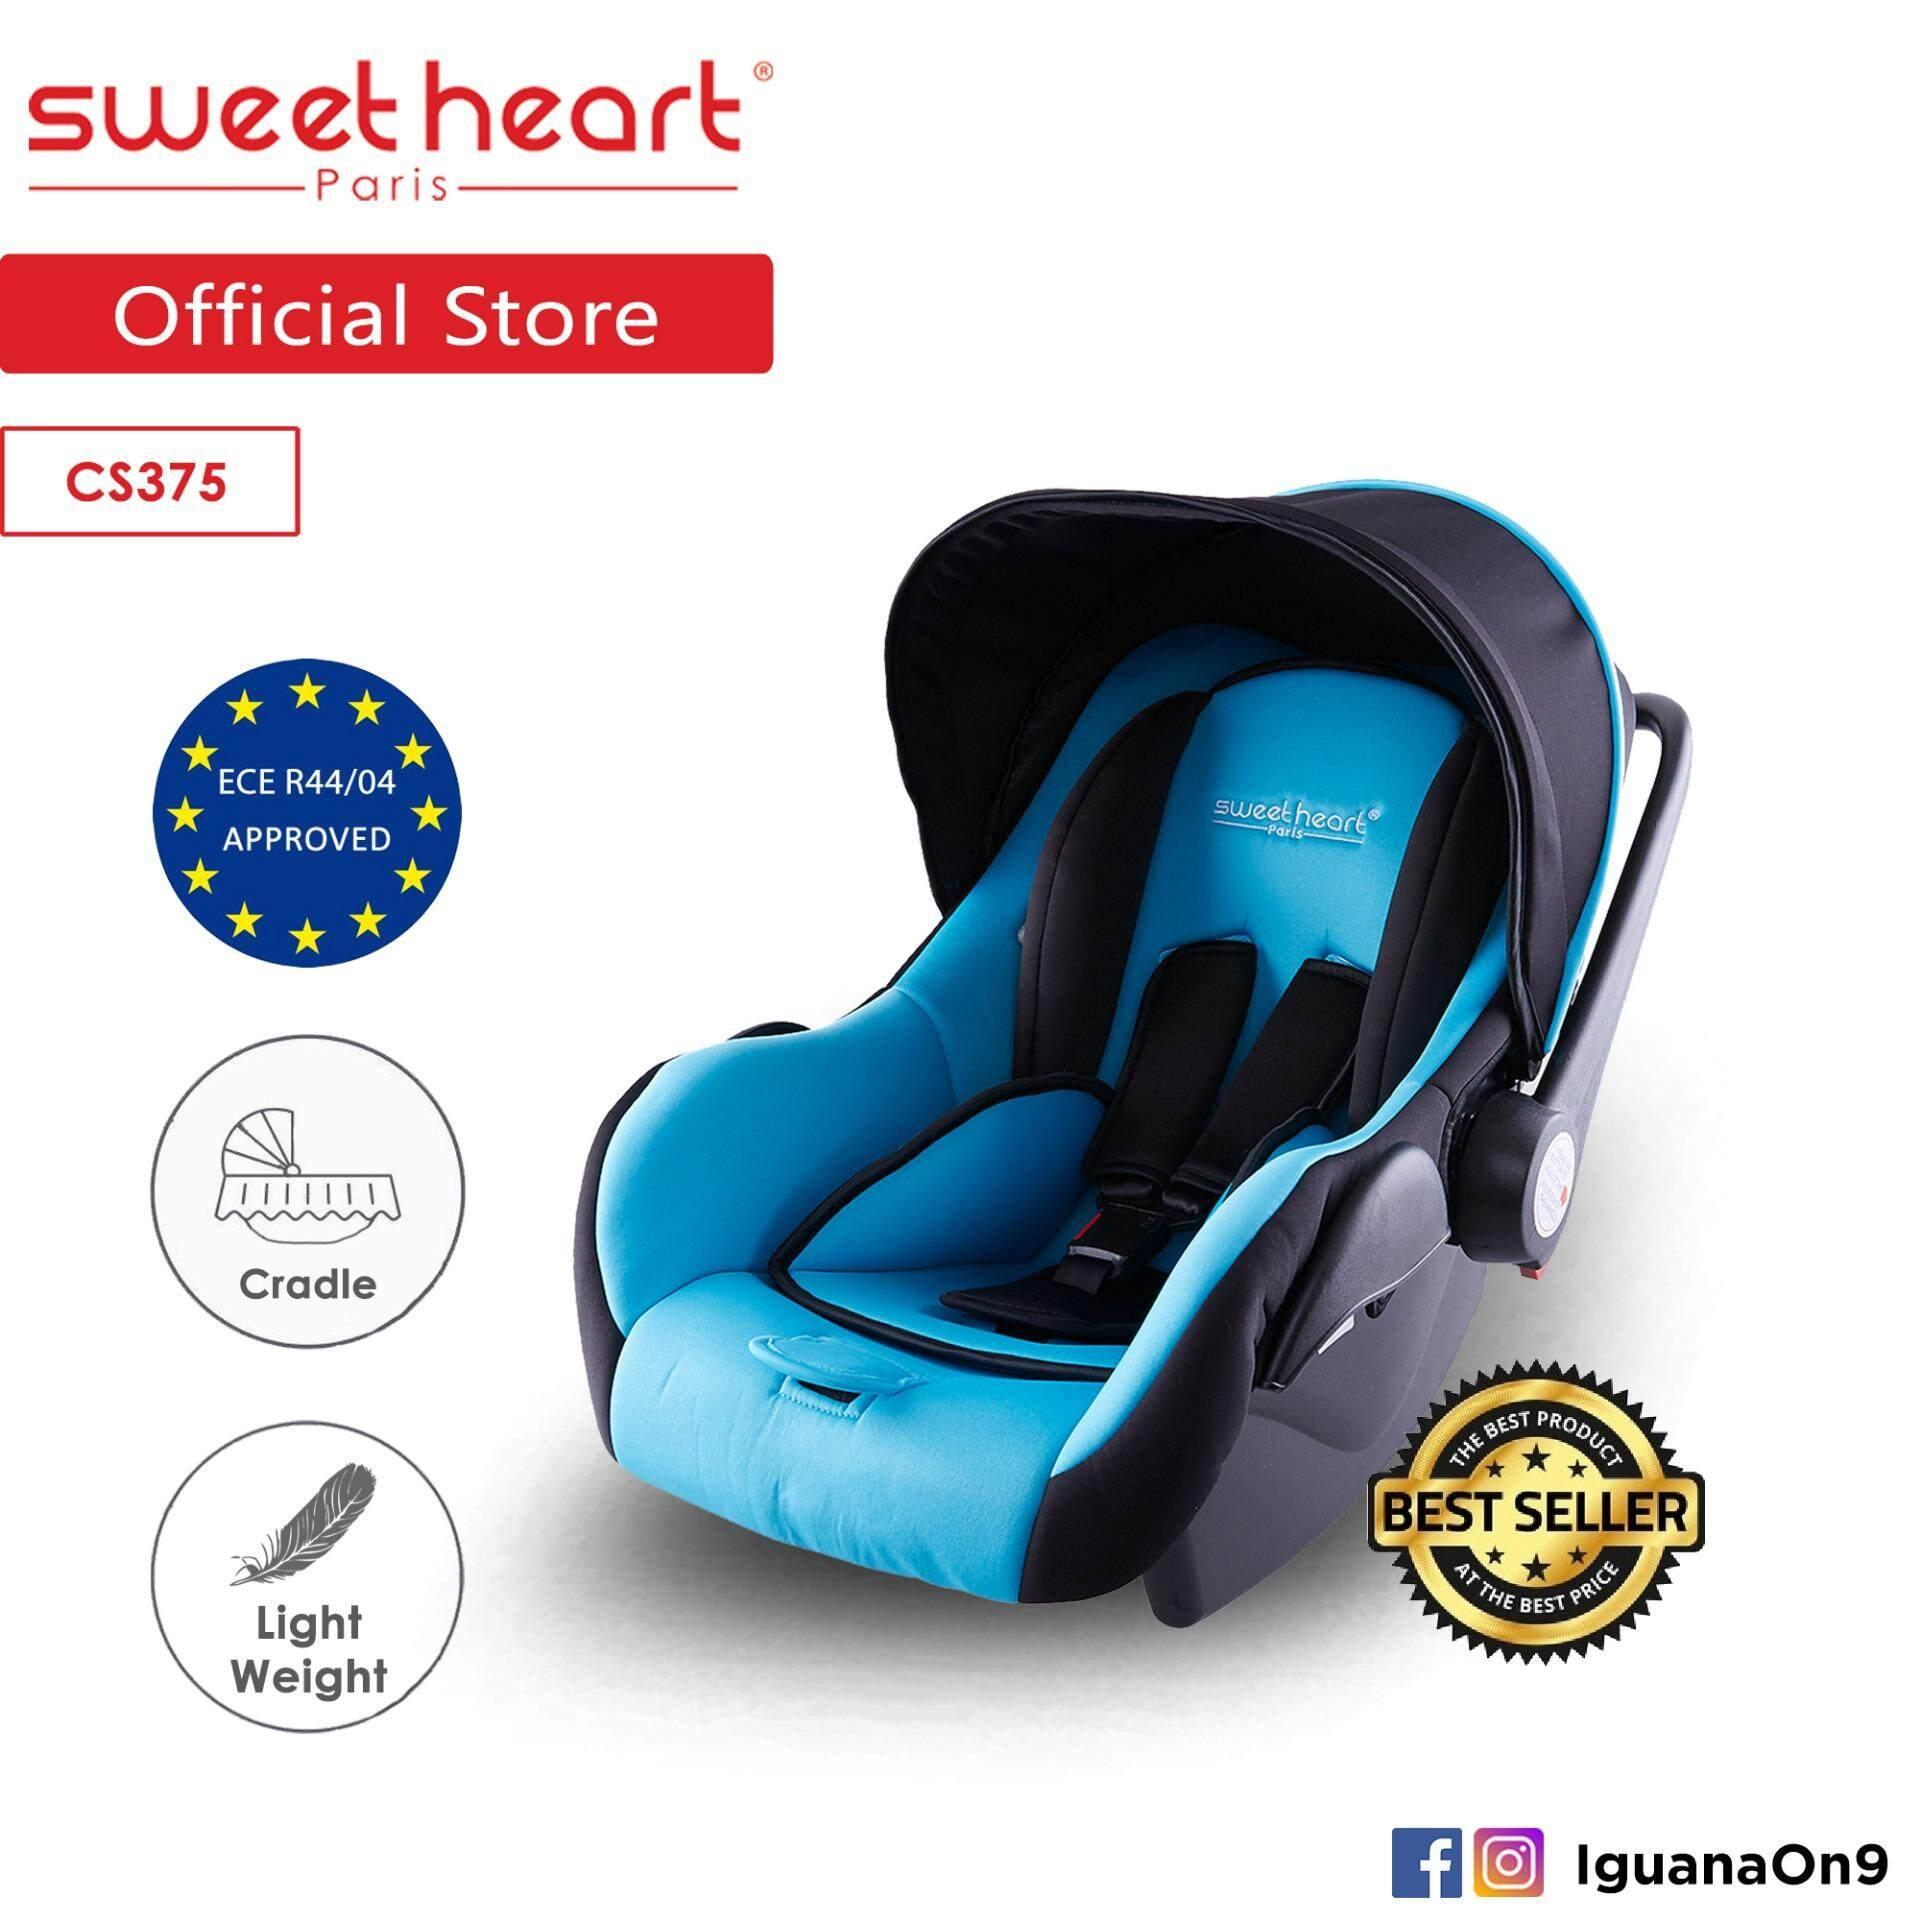 Sweet Heart Paris Cs375 Car Seat Carrier คาร์ซีทเด็กอ่อน With Adjustable Canopy.